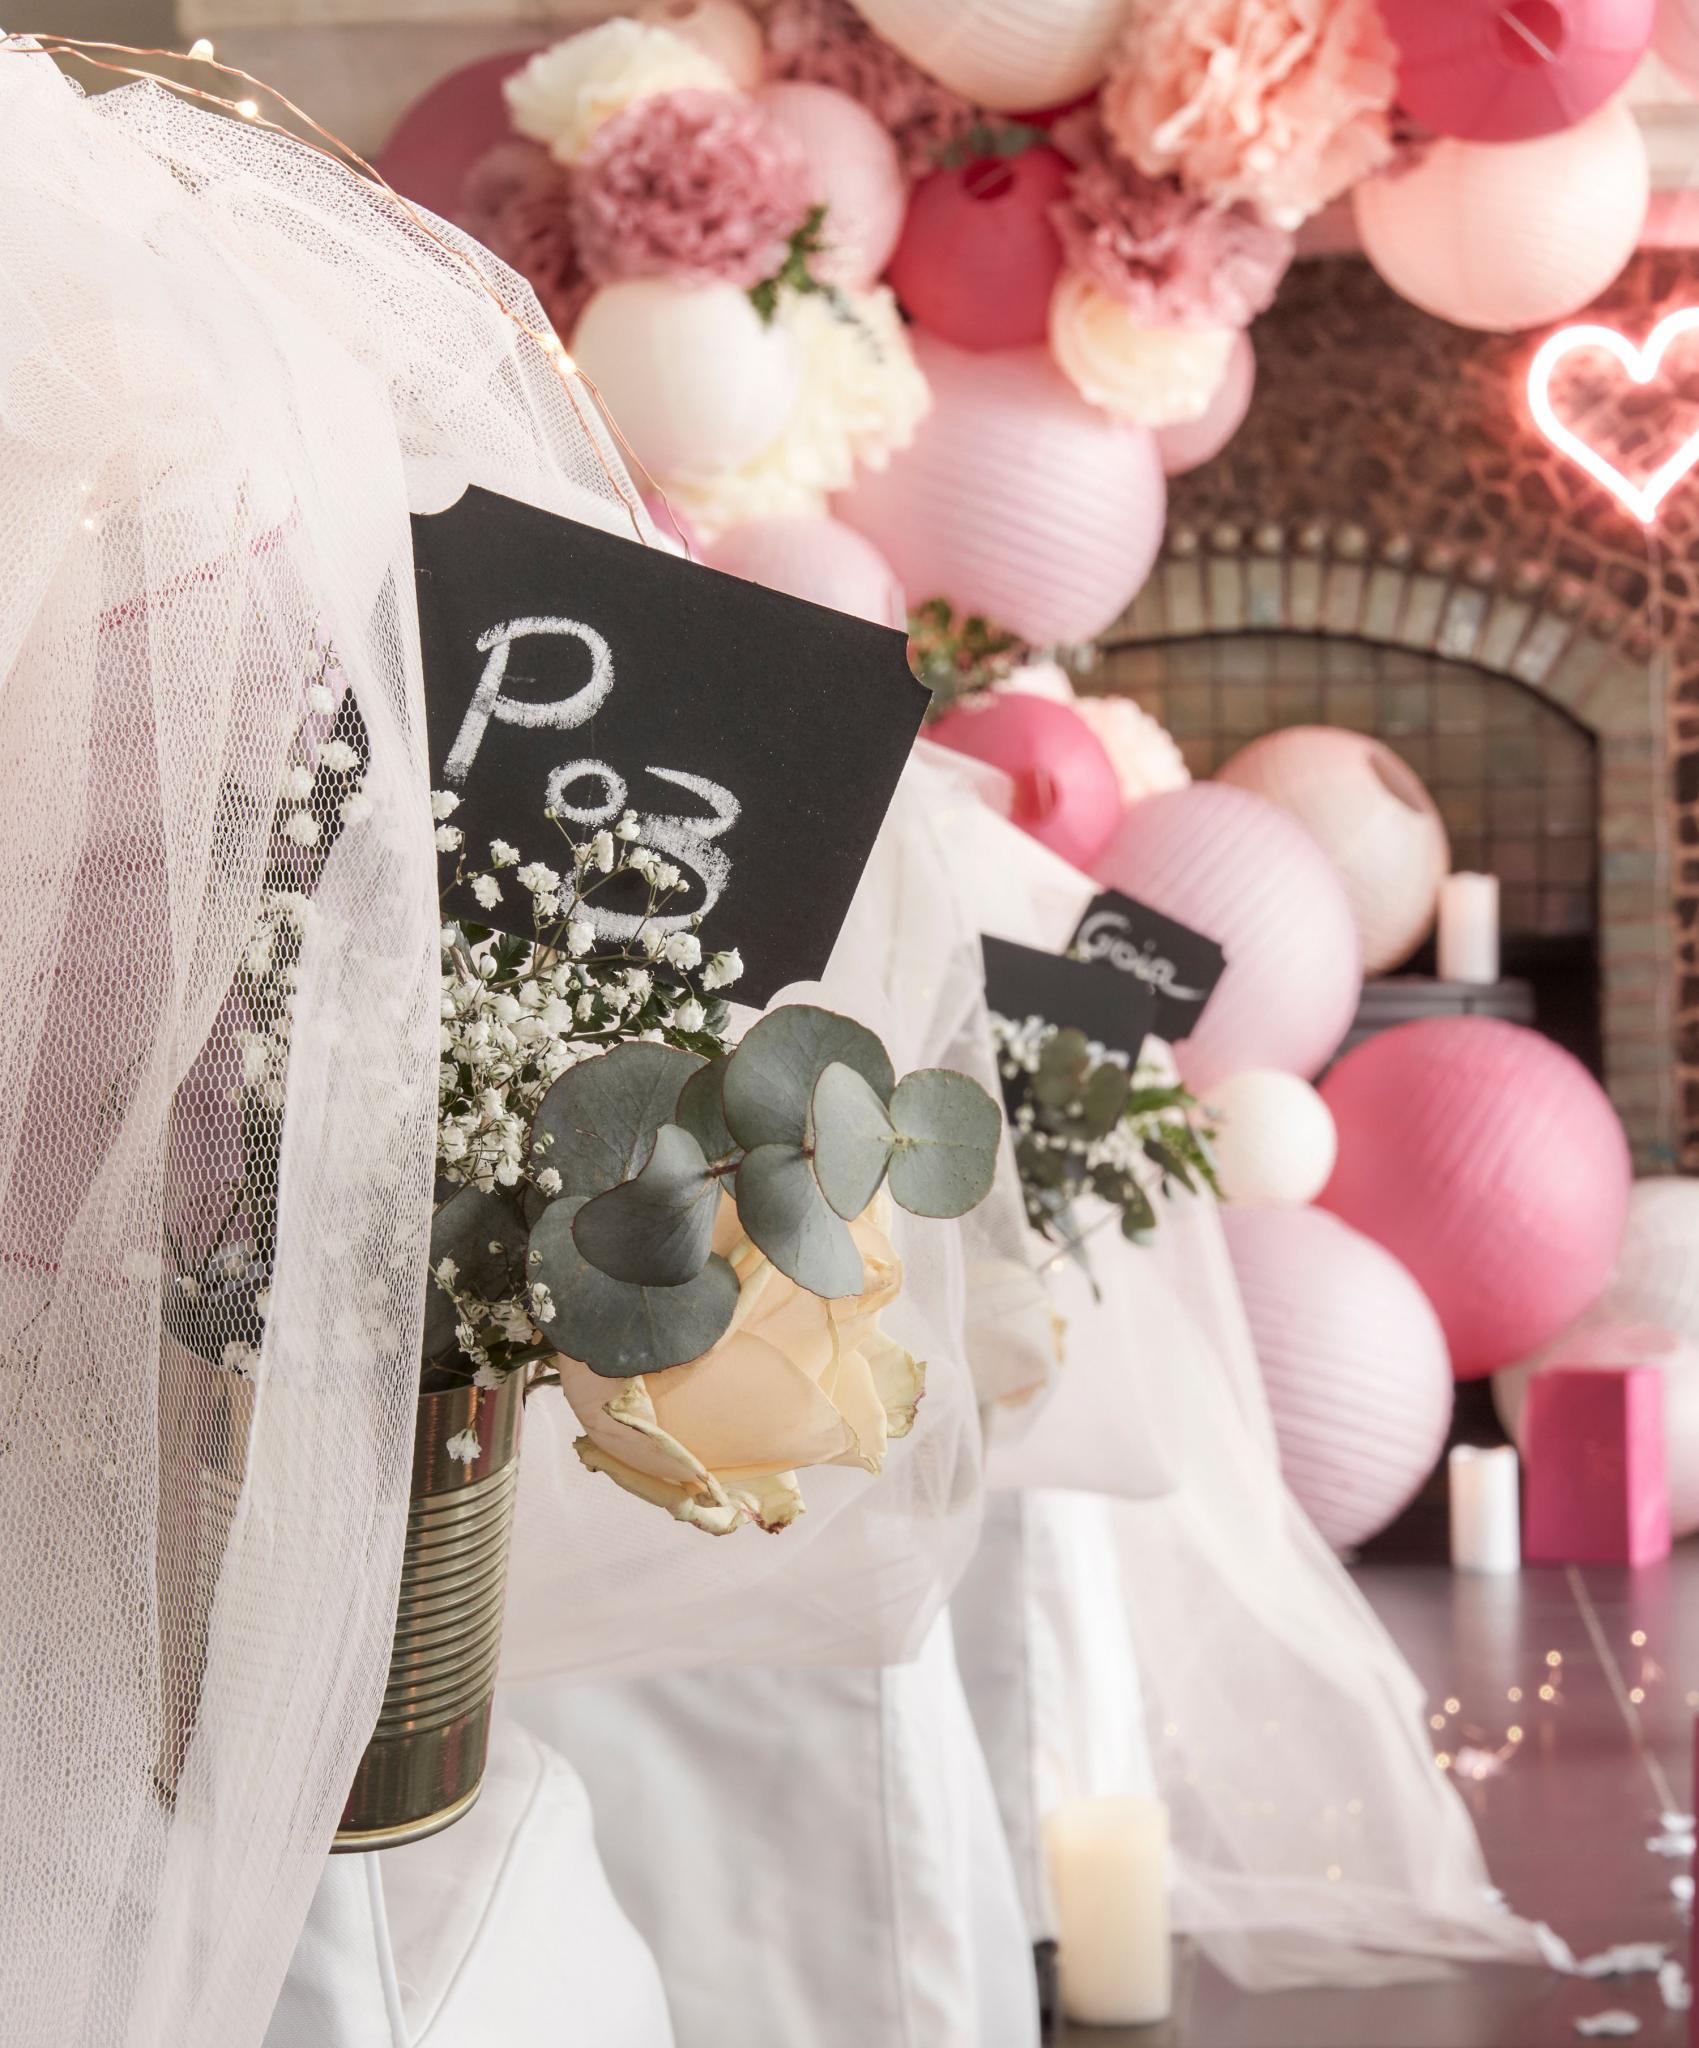 deco-ceremonie-boite-conserve-mariage